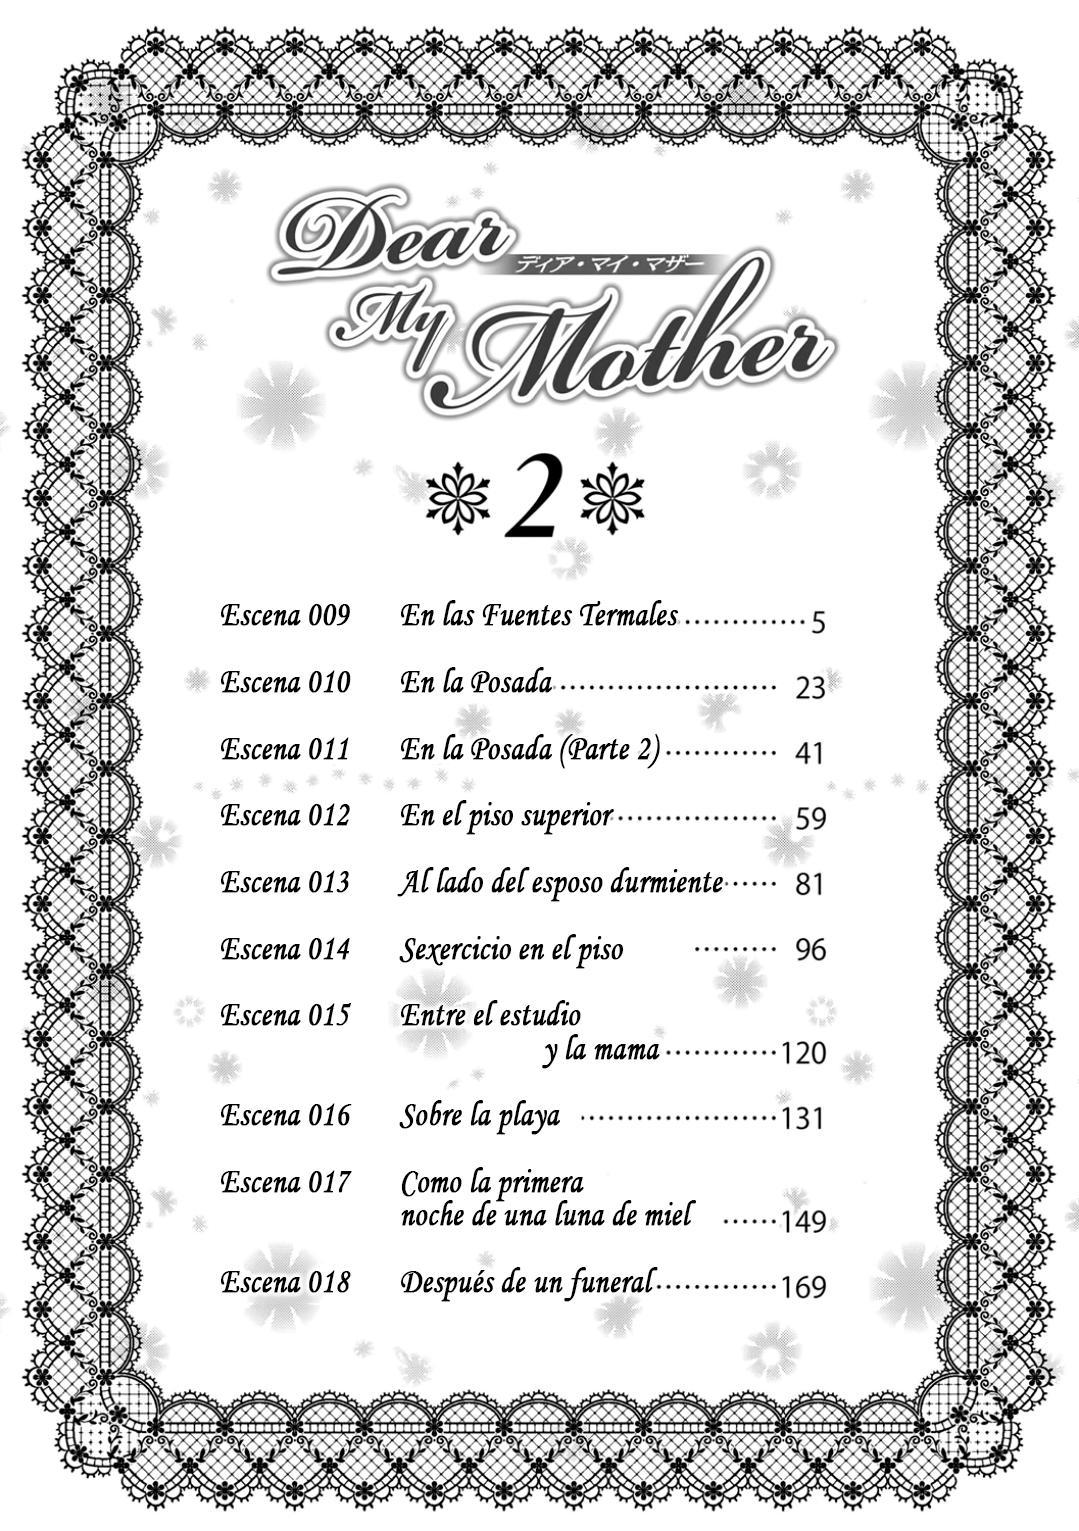 Dear My Mother 2 Ch. 1-6 4